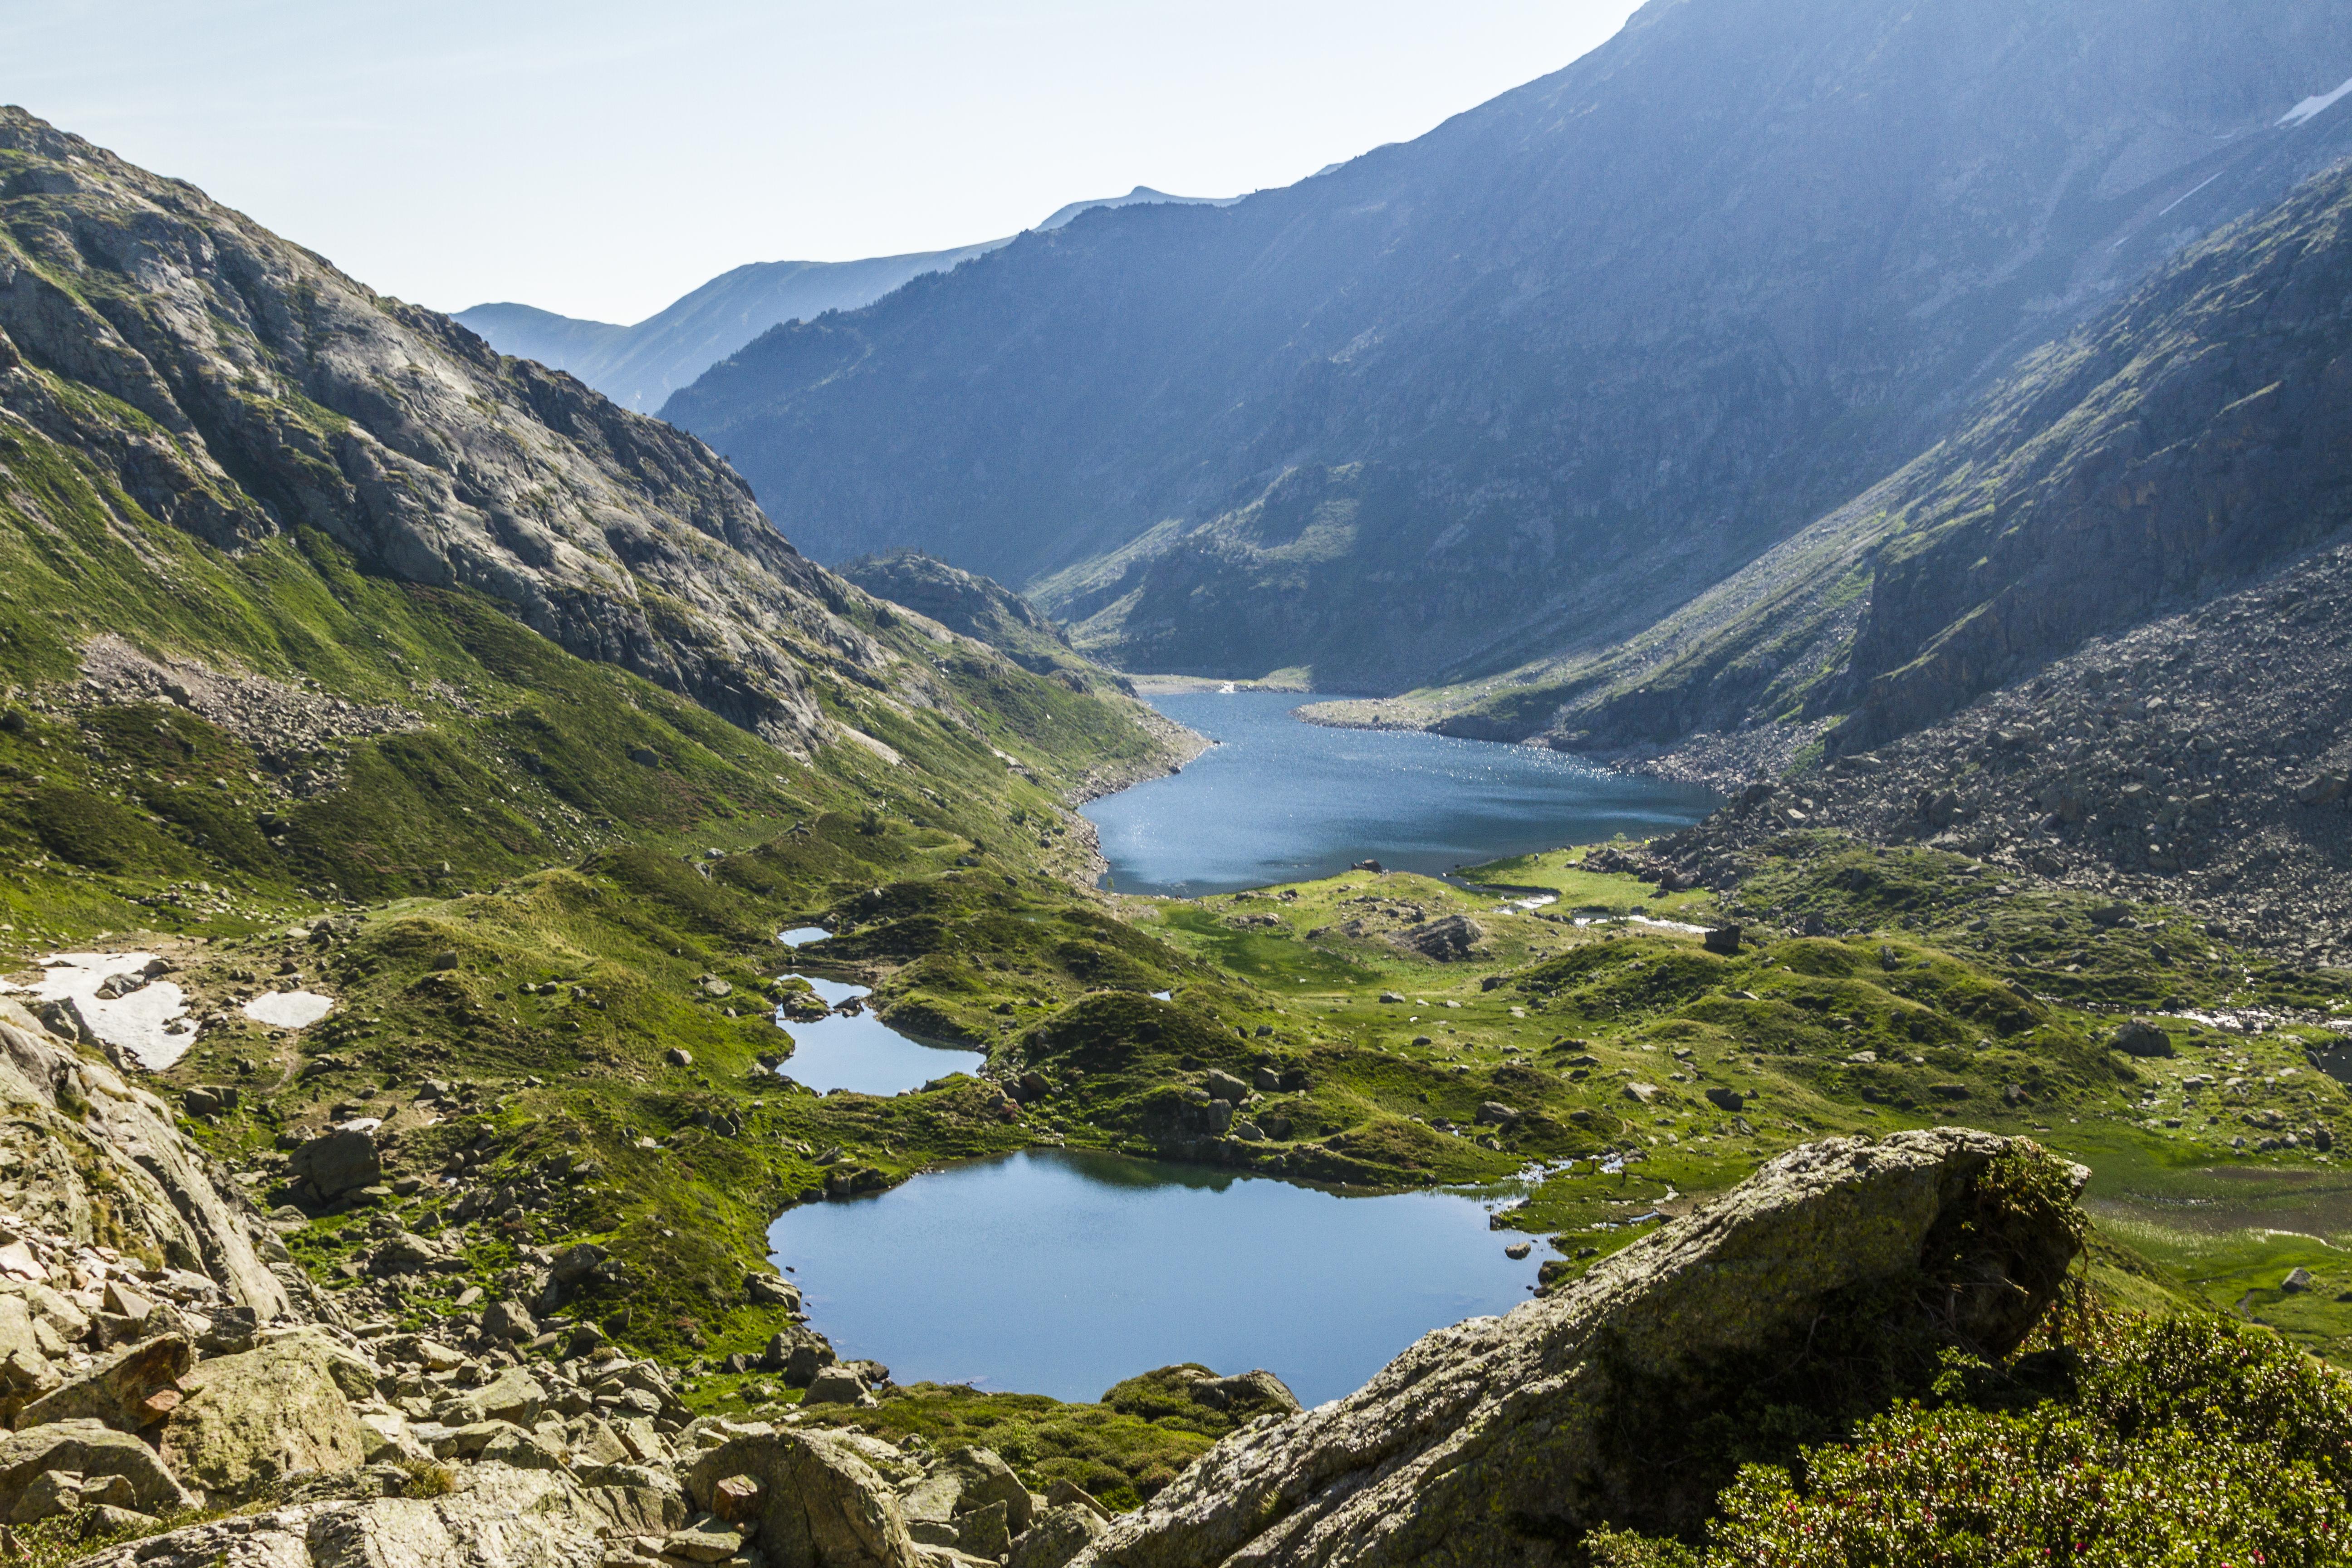 #3 Chemin des lacs